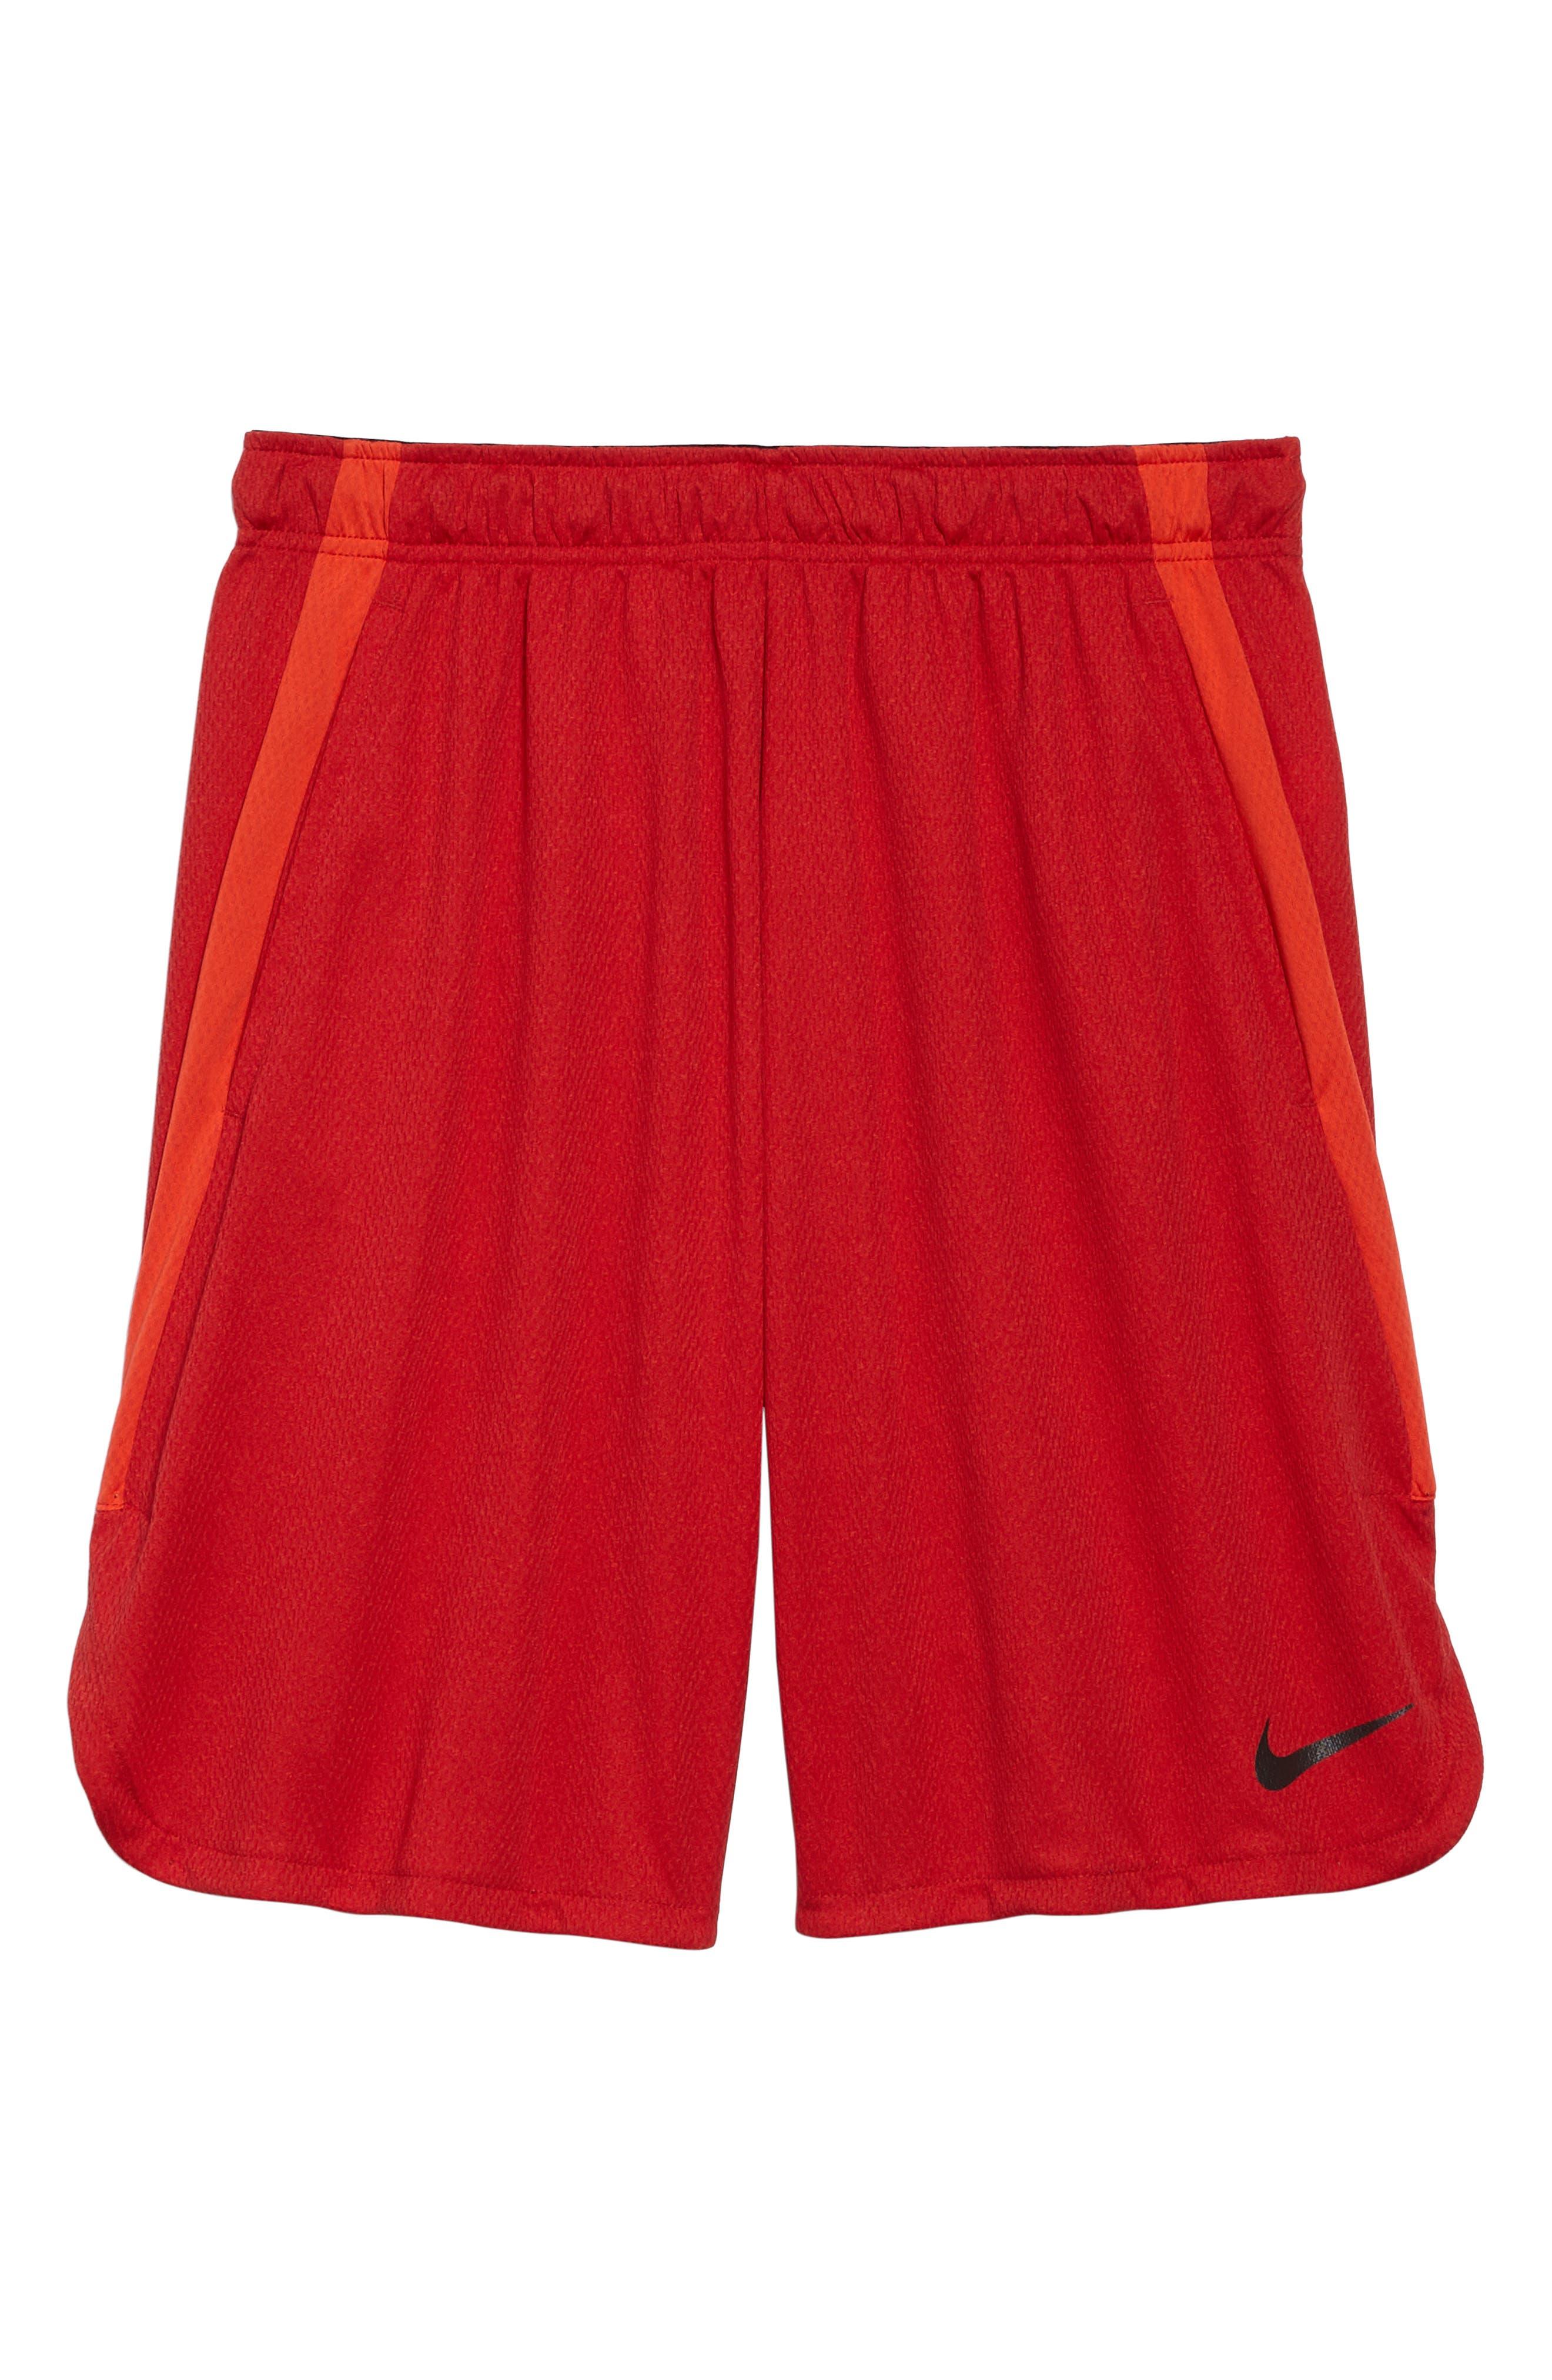 Training Dry 4.0 Shorts,                             Alternate thumbnail 35, color,